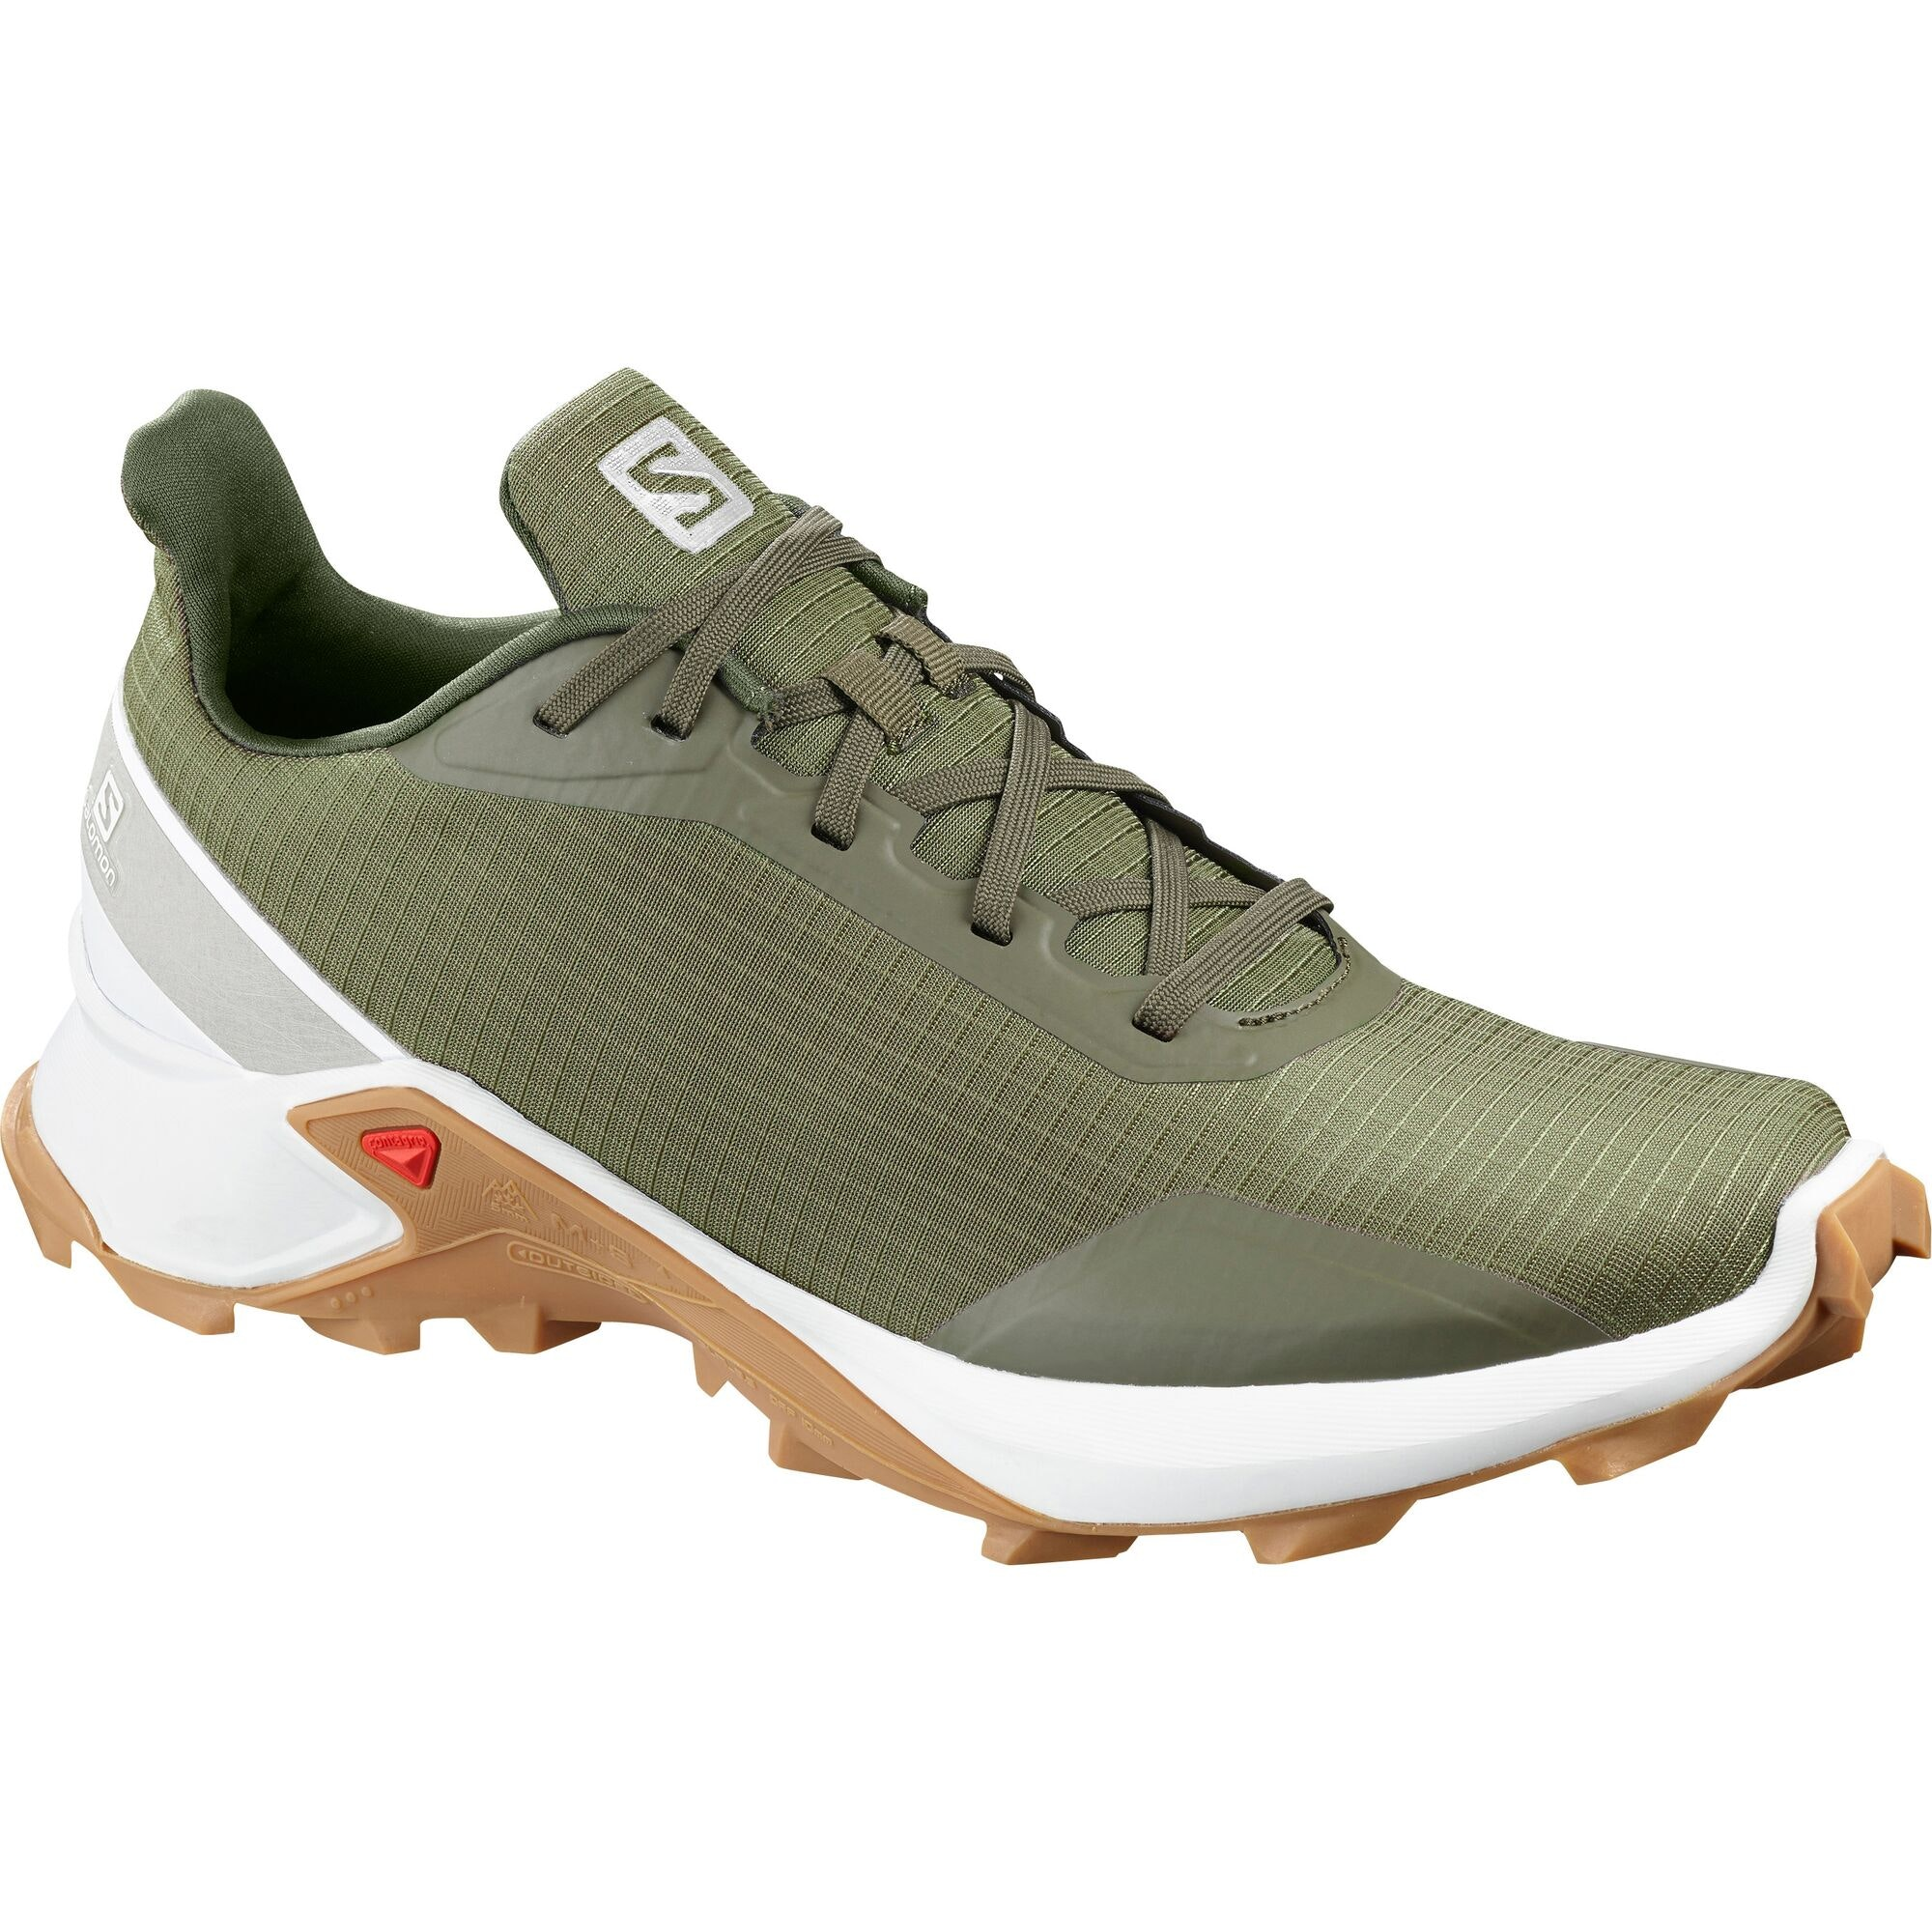 salomon shoes kathmandu Hiking Boots